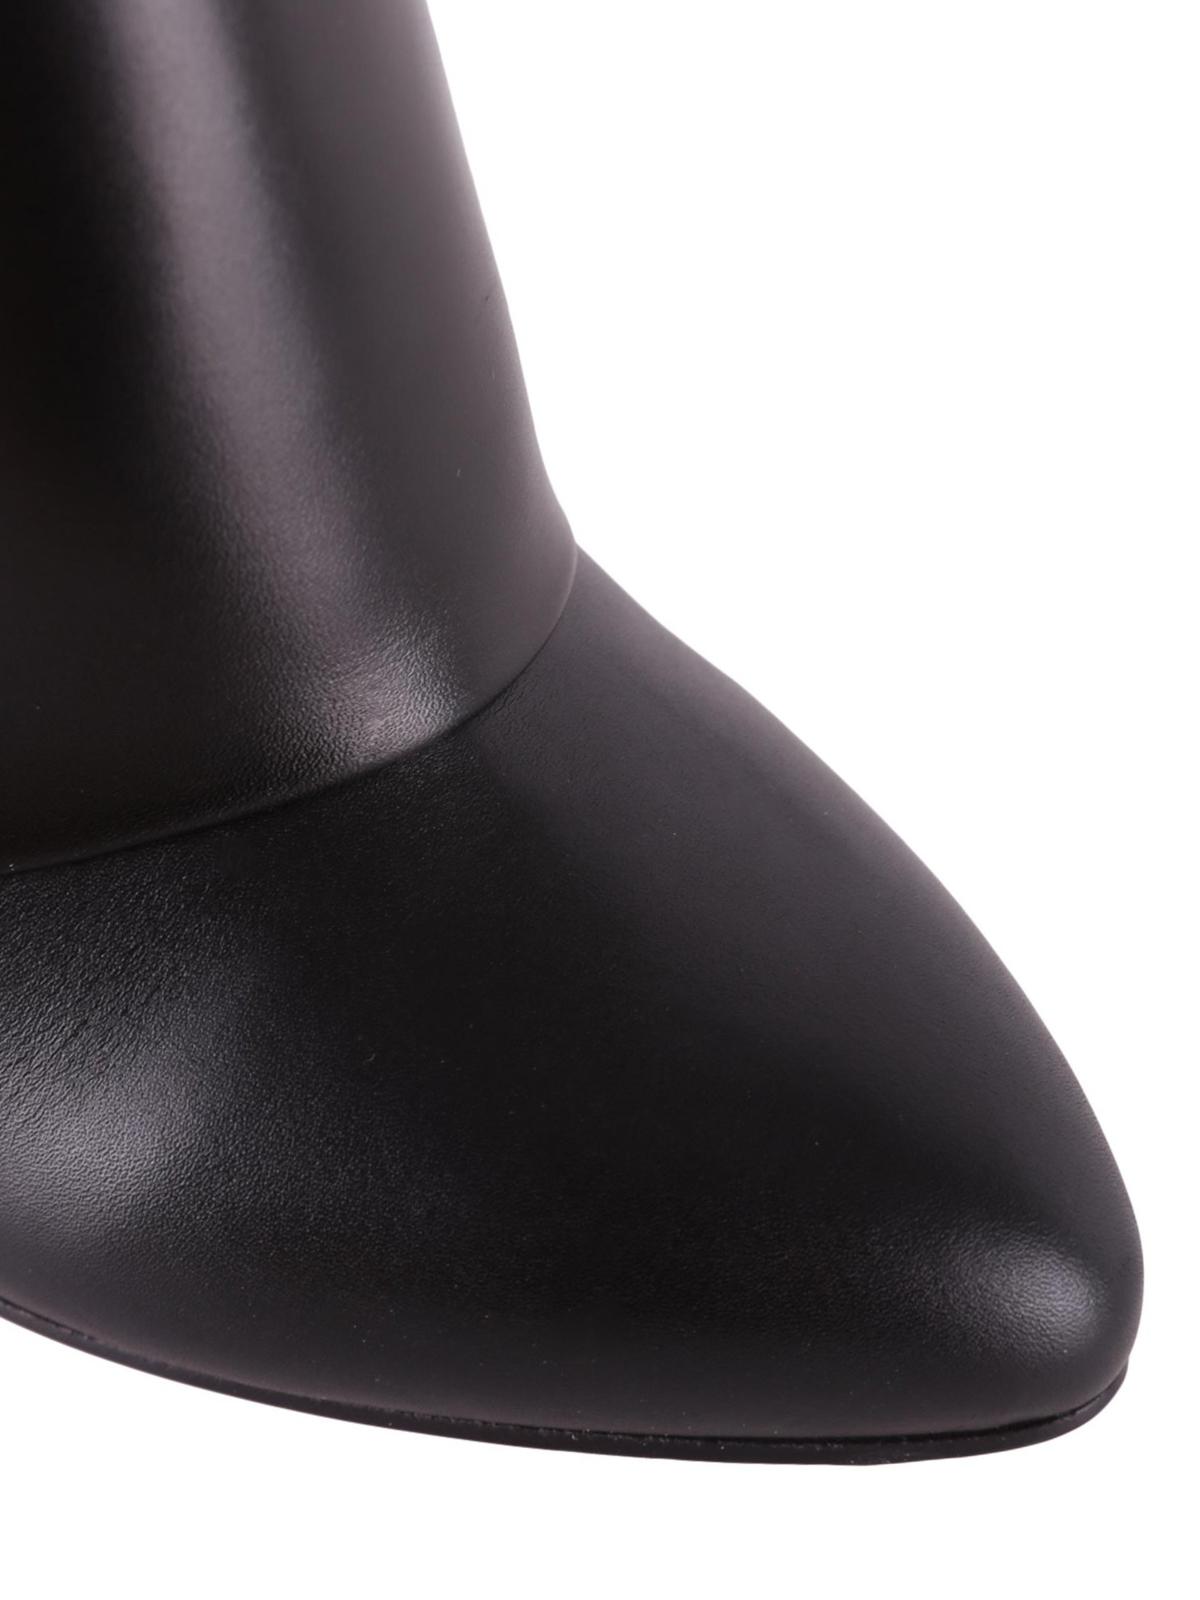 Givenchy Stivaletti Shark Lock in pelle tronchetti